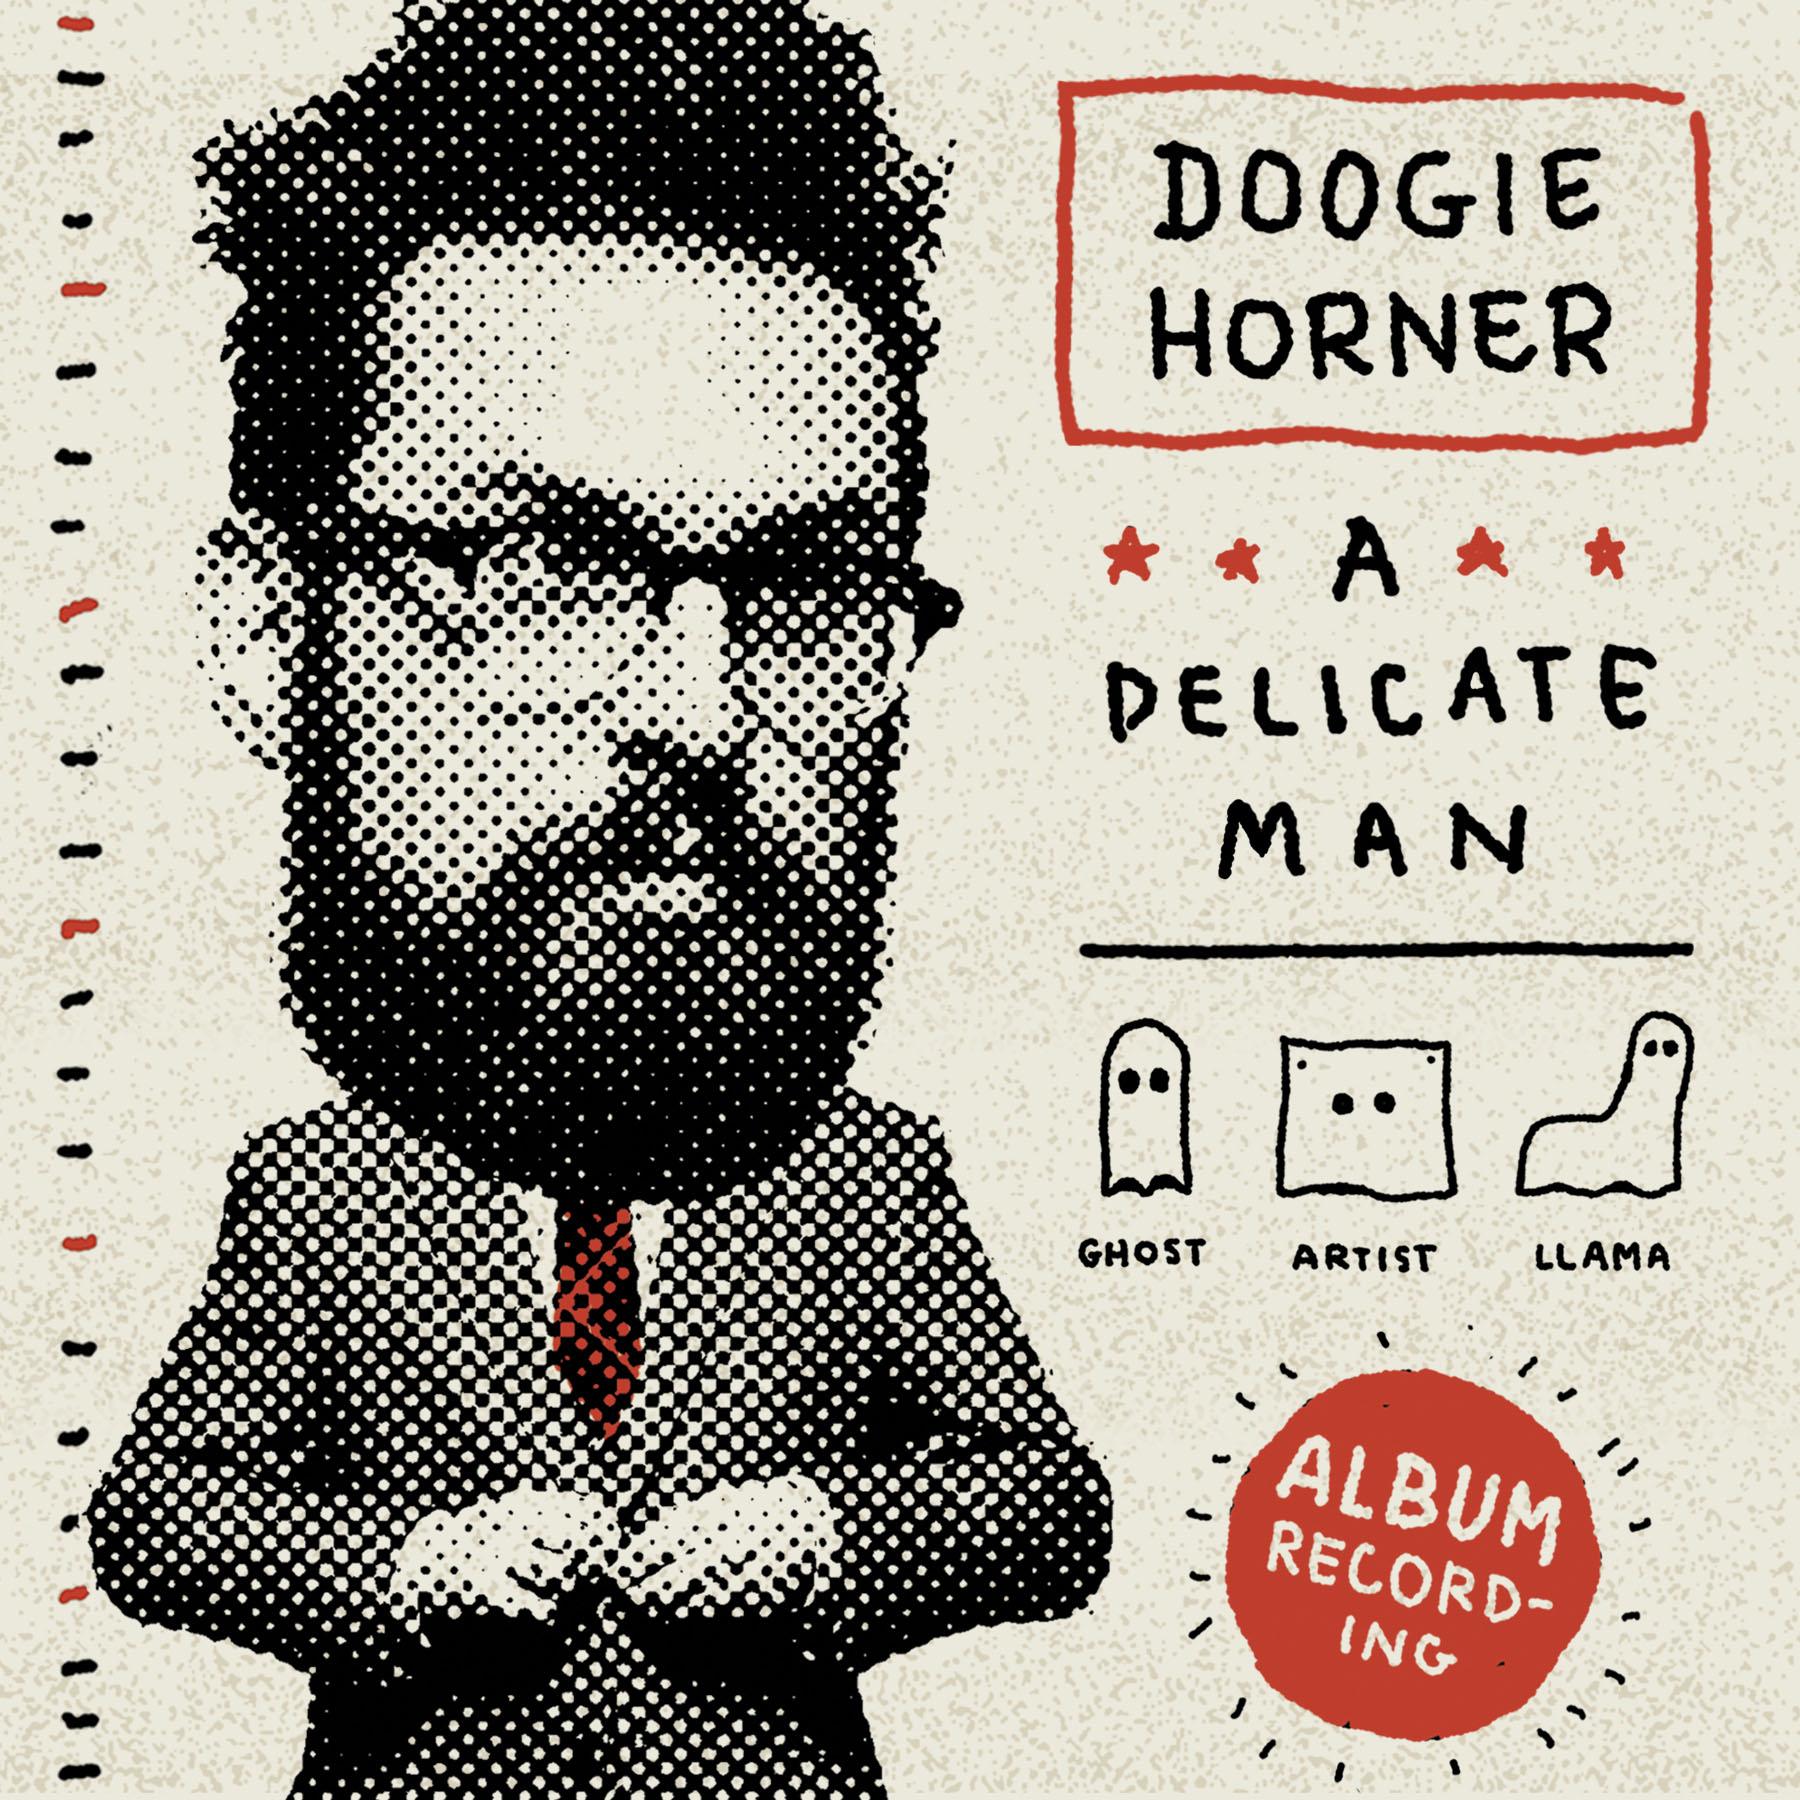 doogie horner-a delicate man-brown.jpg